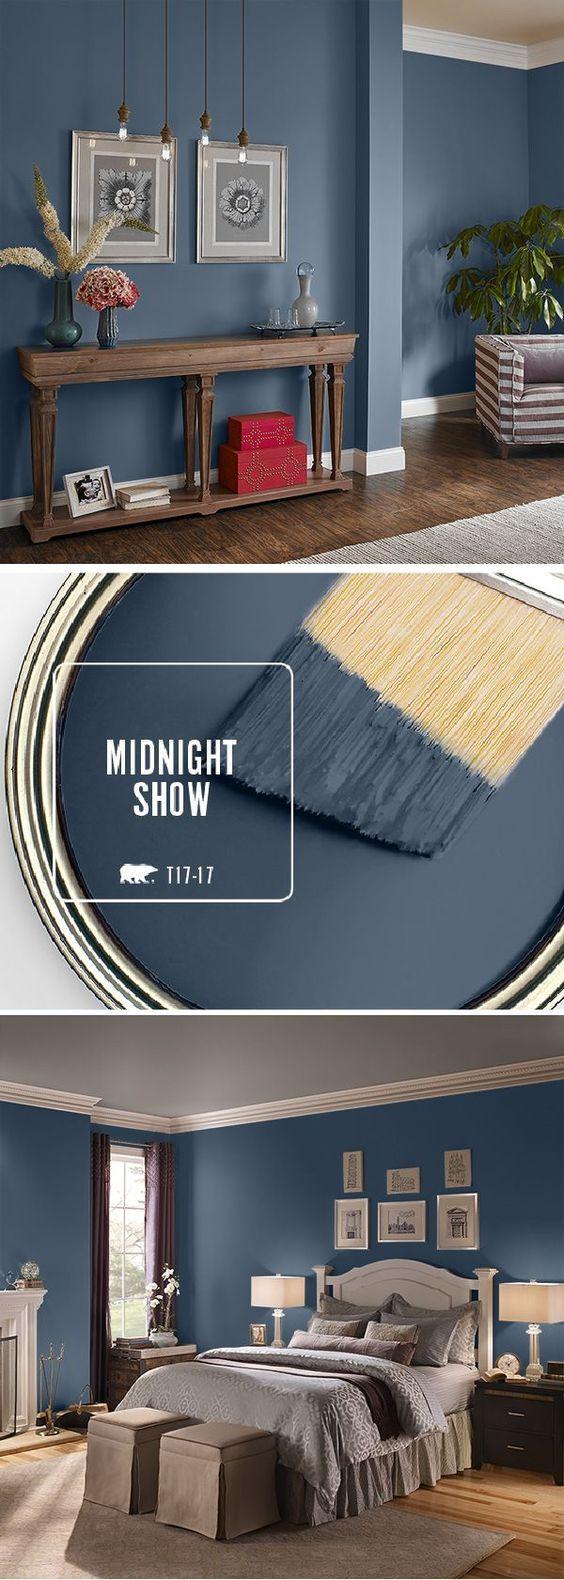 83 best Whole new house images on Pinterest | Bedroom, Glazed doors ...